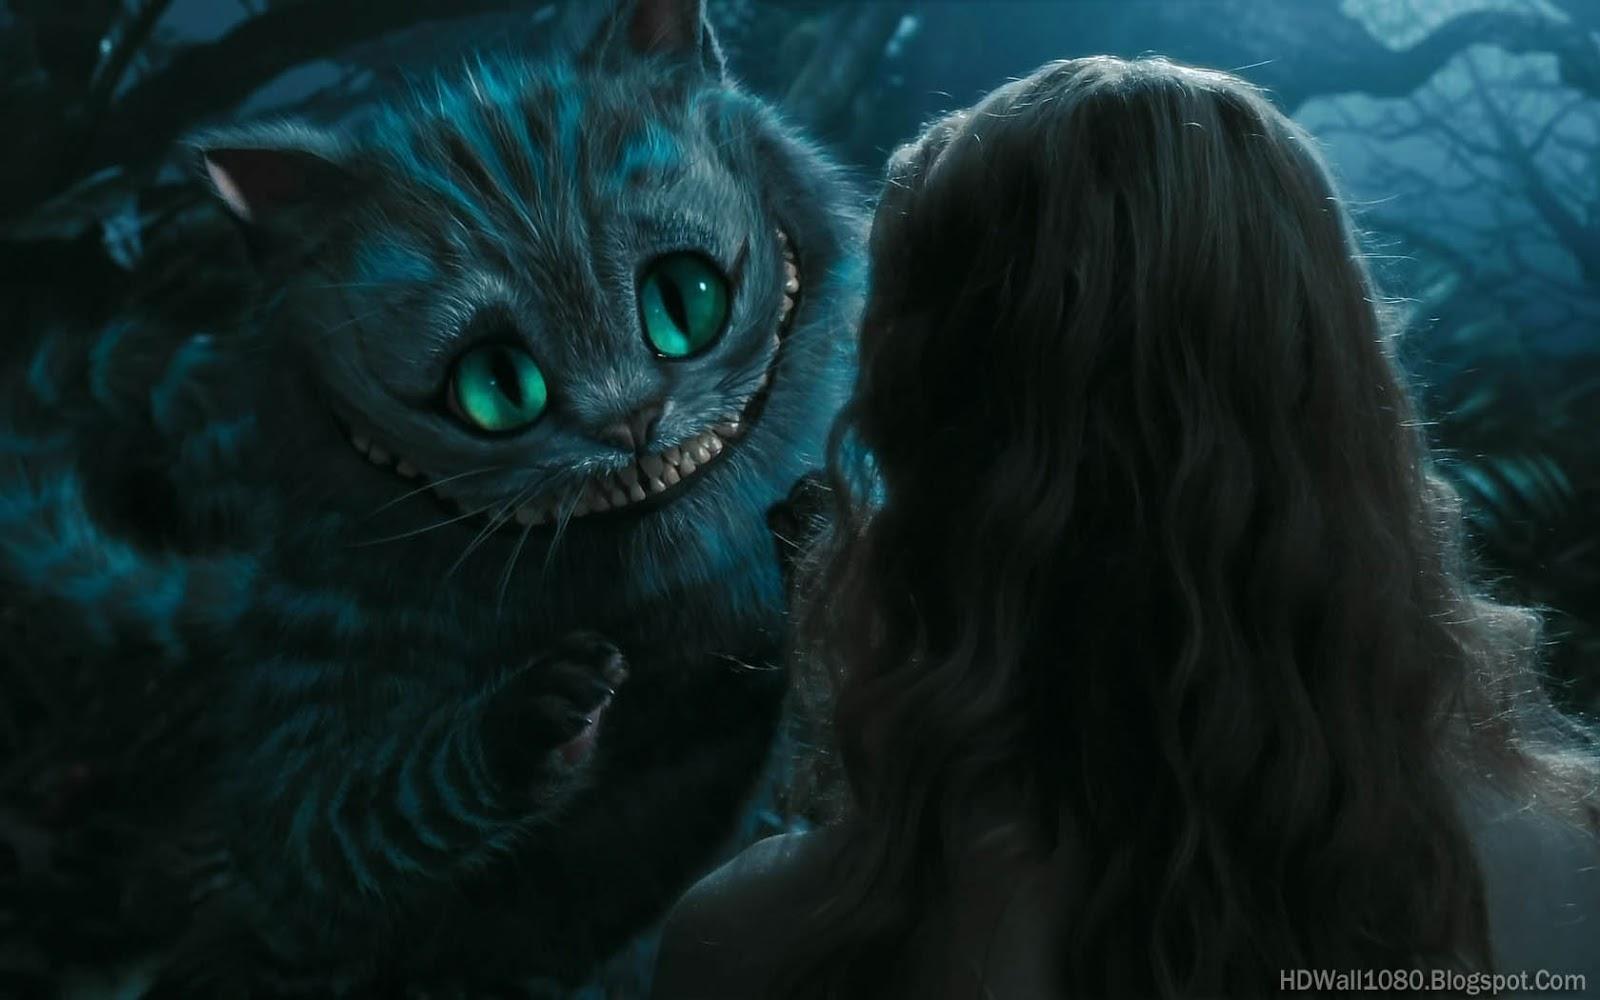 http://2.bp.blogspot.com/-PJE_URRhgVA/ULja6tUj5VI/AAAAAAAABB4/EzfV2rghEmc/s1600/Alice+In+Wonderland+Cheshire+Cat+Wallpaper.jpg